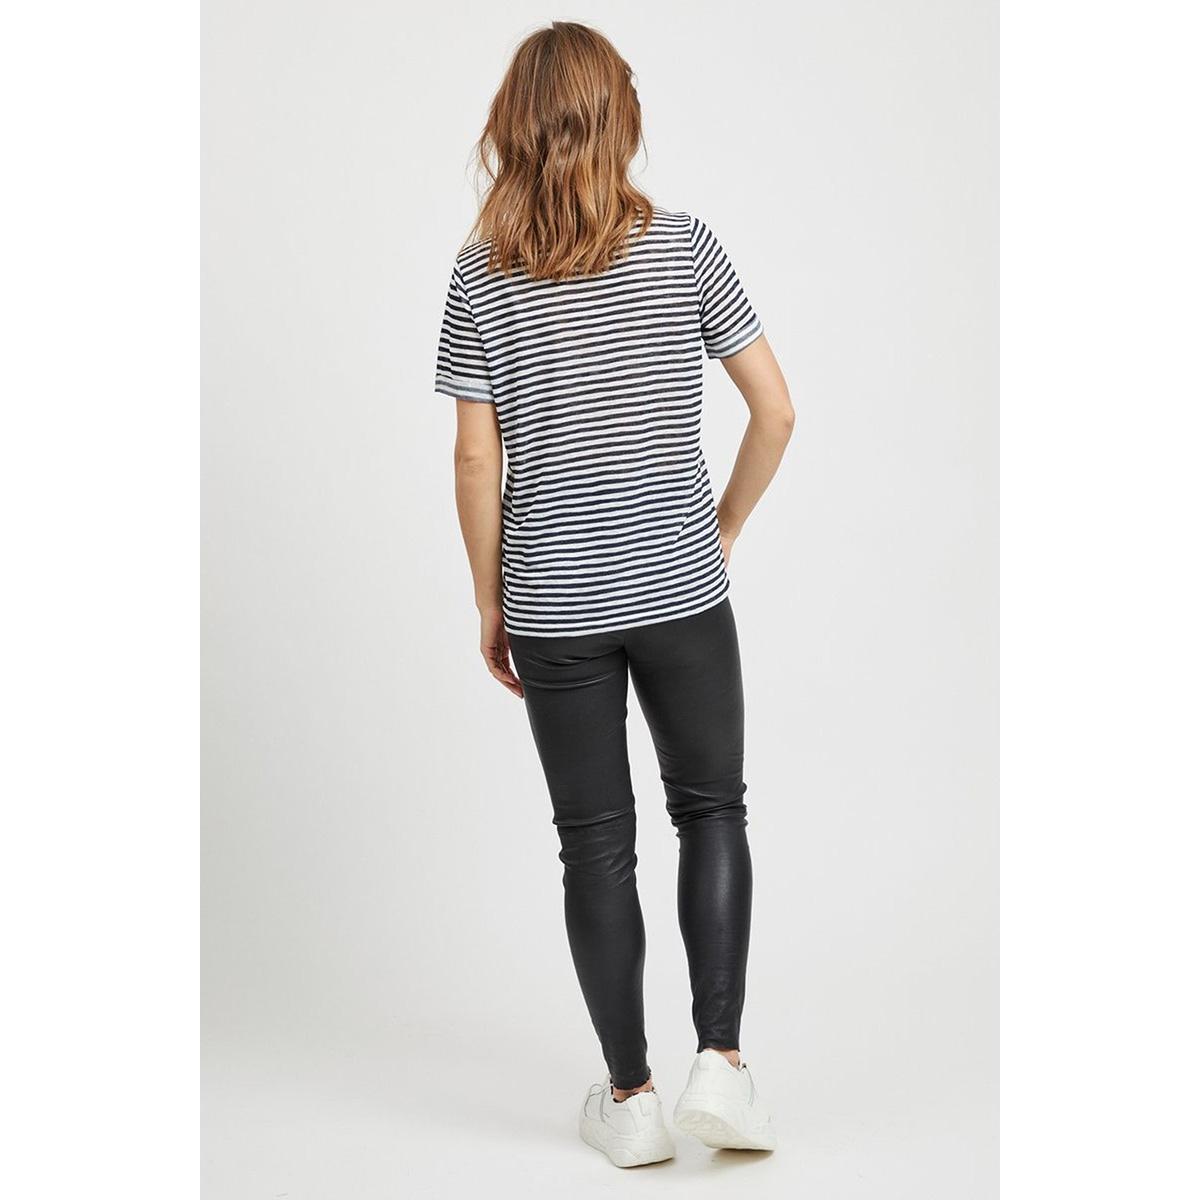 objtessi slub s/s v-neck noos 23023816 object t-shirt sky captain/white stripes